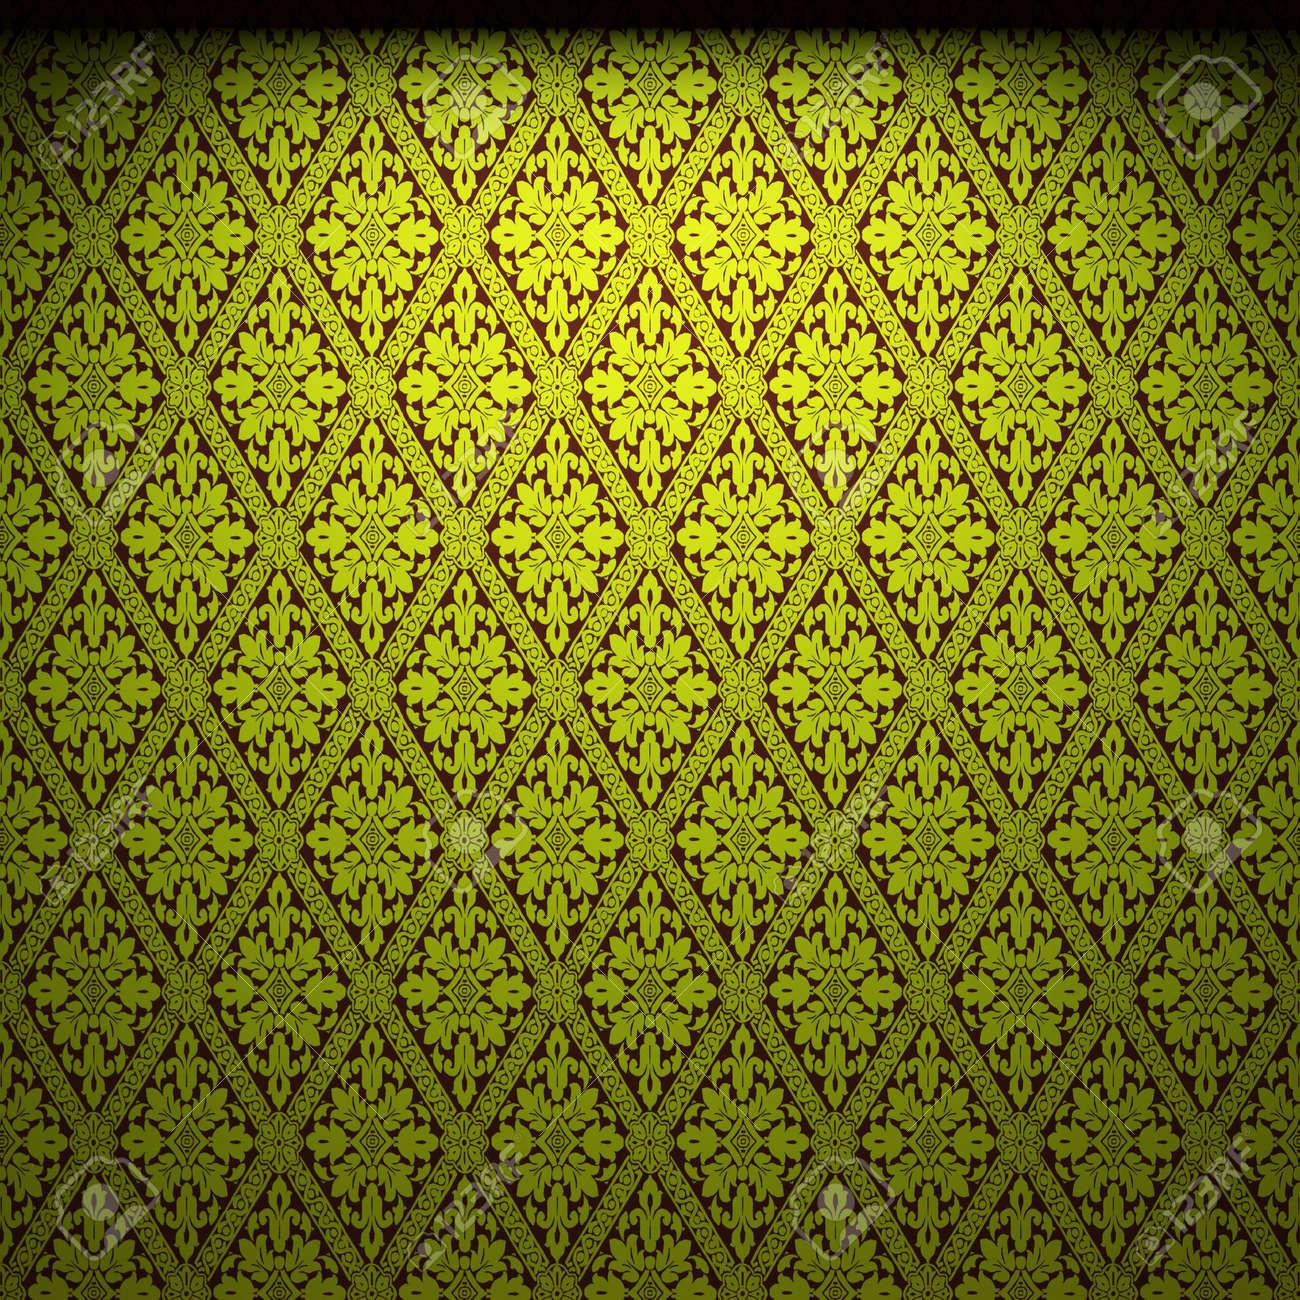 illuminated fabric wallpaper Stock Photo - 6832545